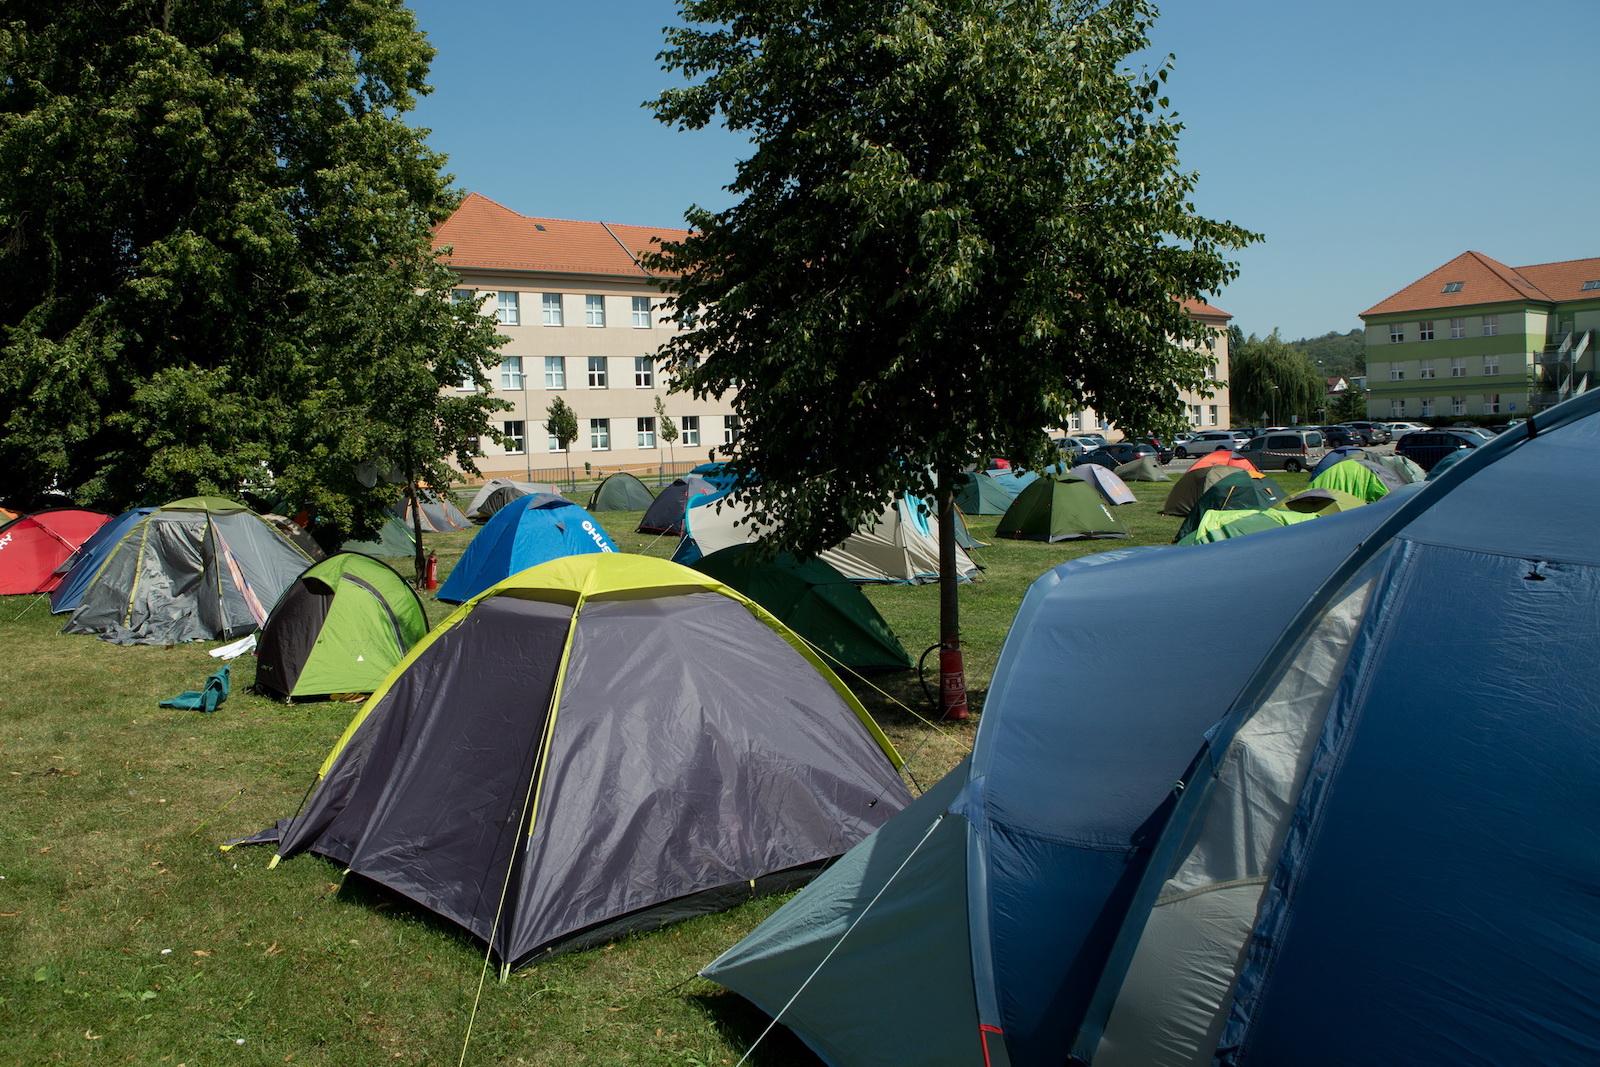 Accommodation Still Available!